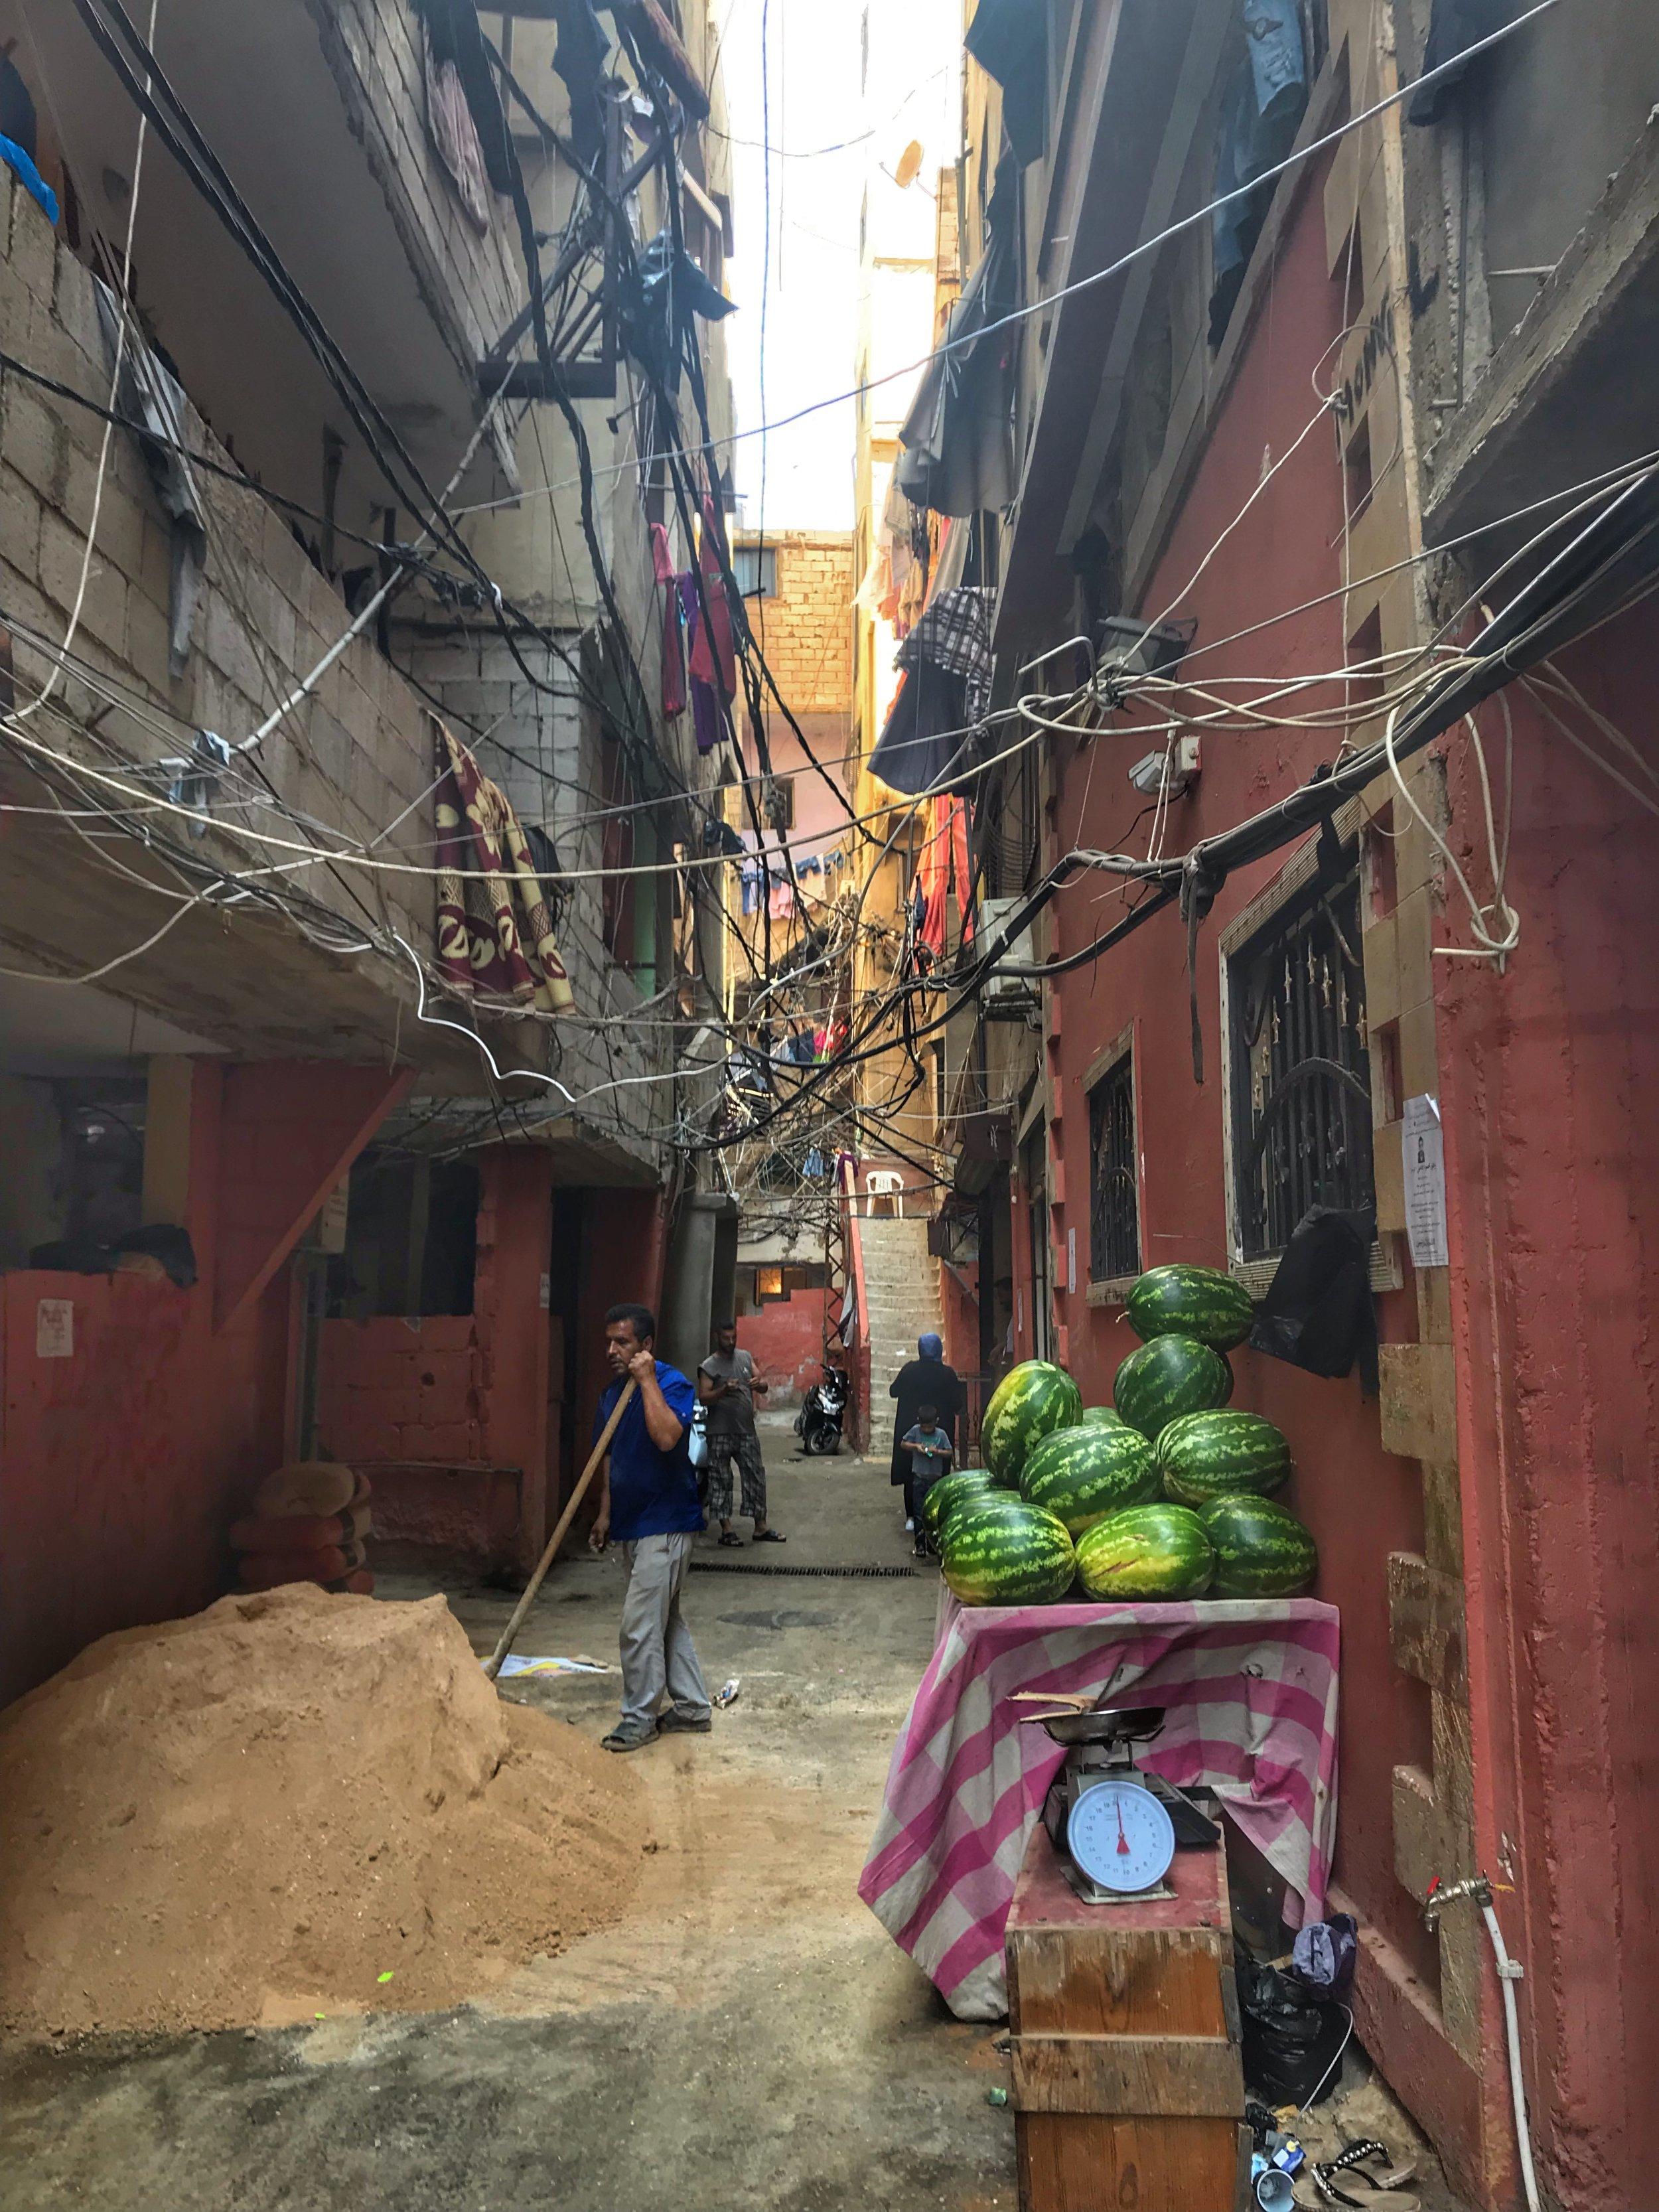 Shatila Palestinian refugee camp. Beirut, Lebanon. August 8, 2019.